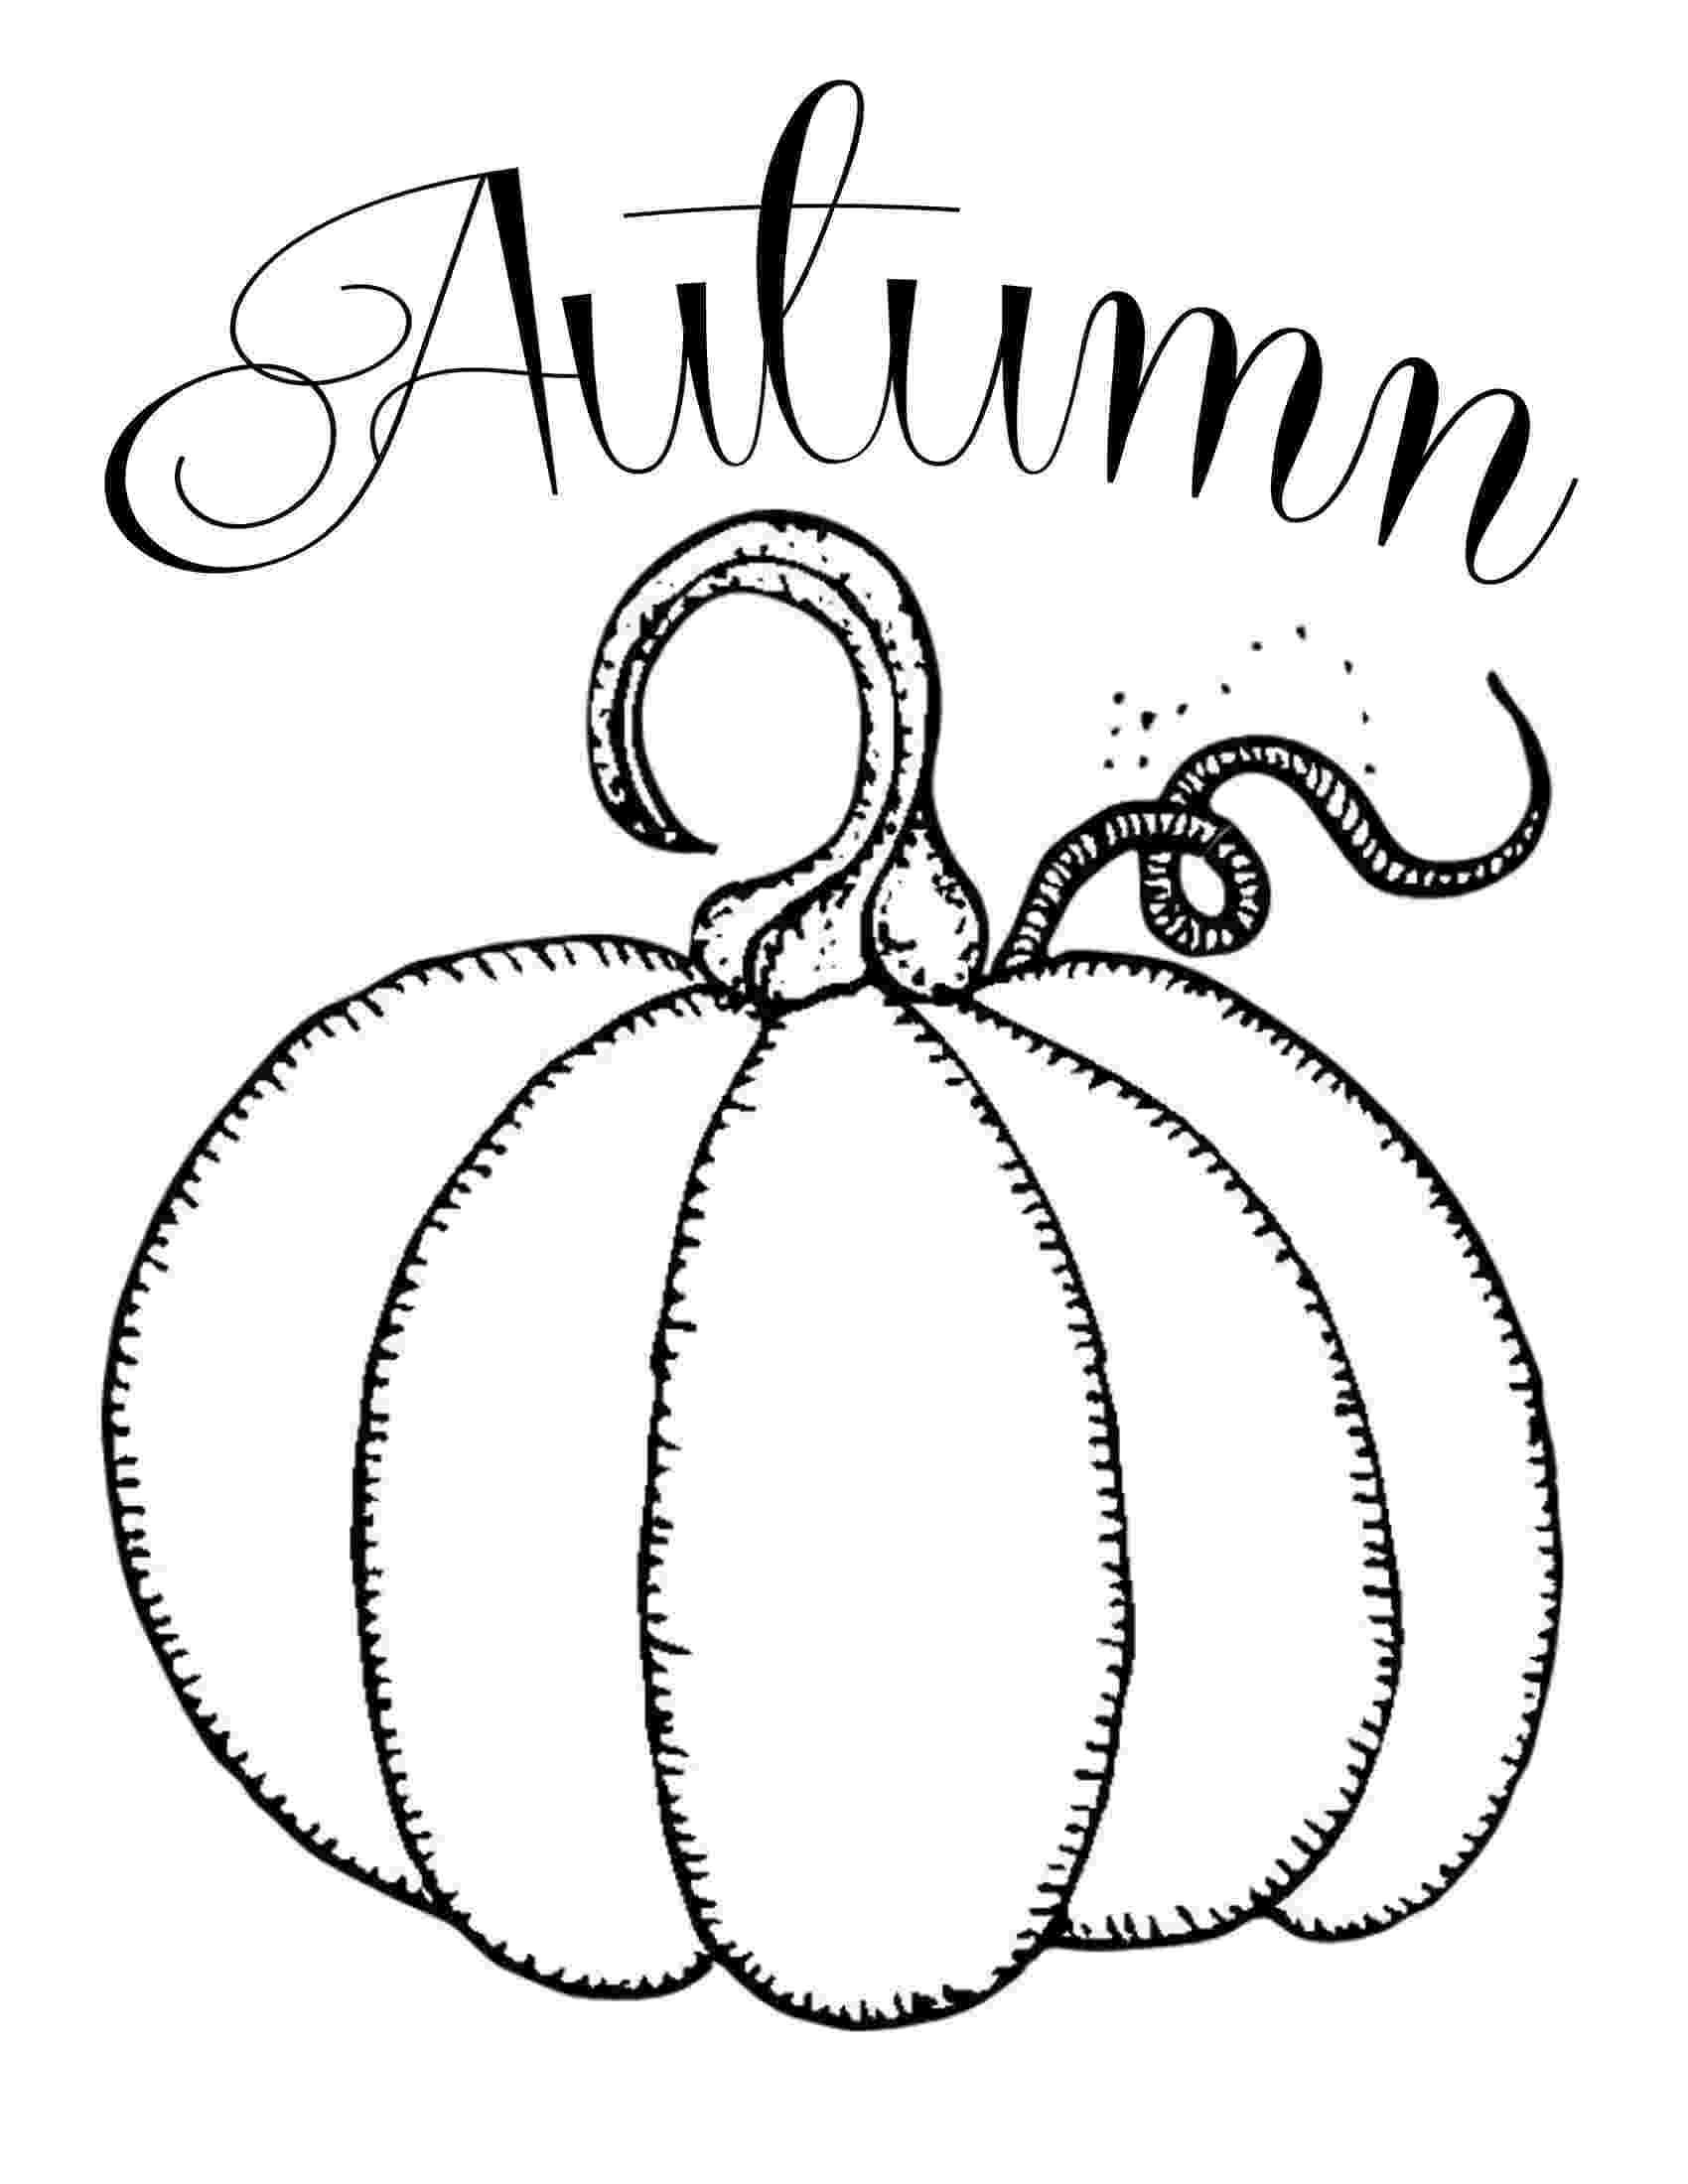 pumpkin coloring pattern pumpkin outline printable clipartioncom coloring pumpkin pattern